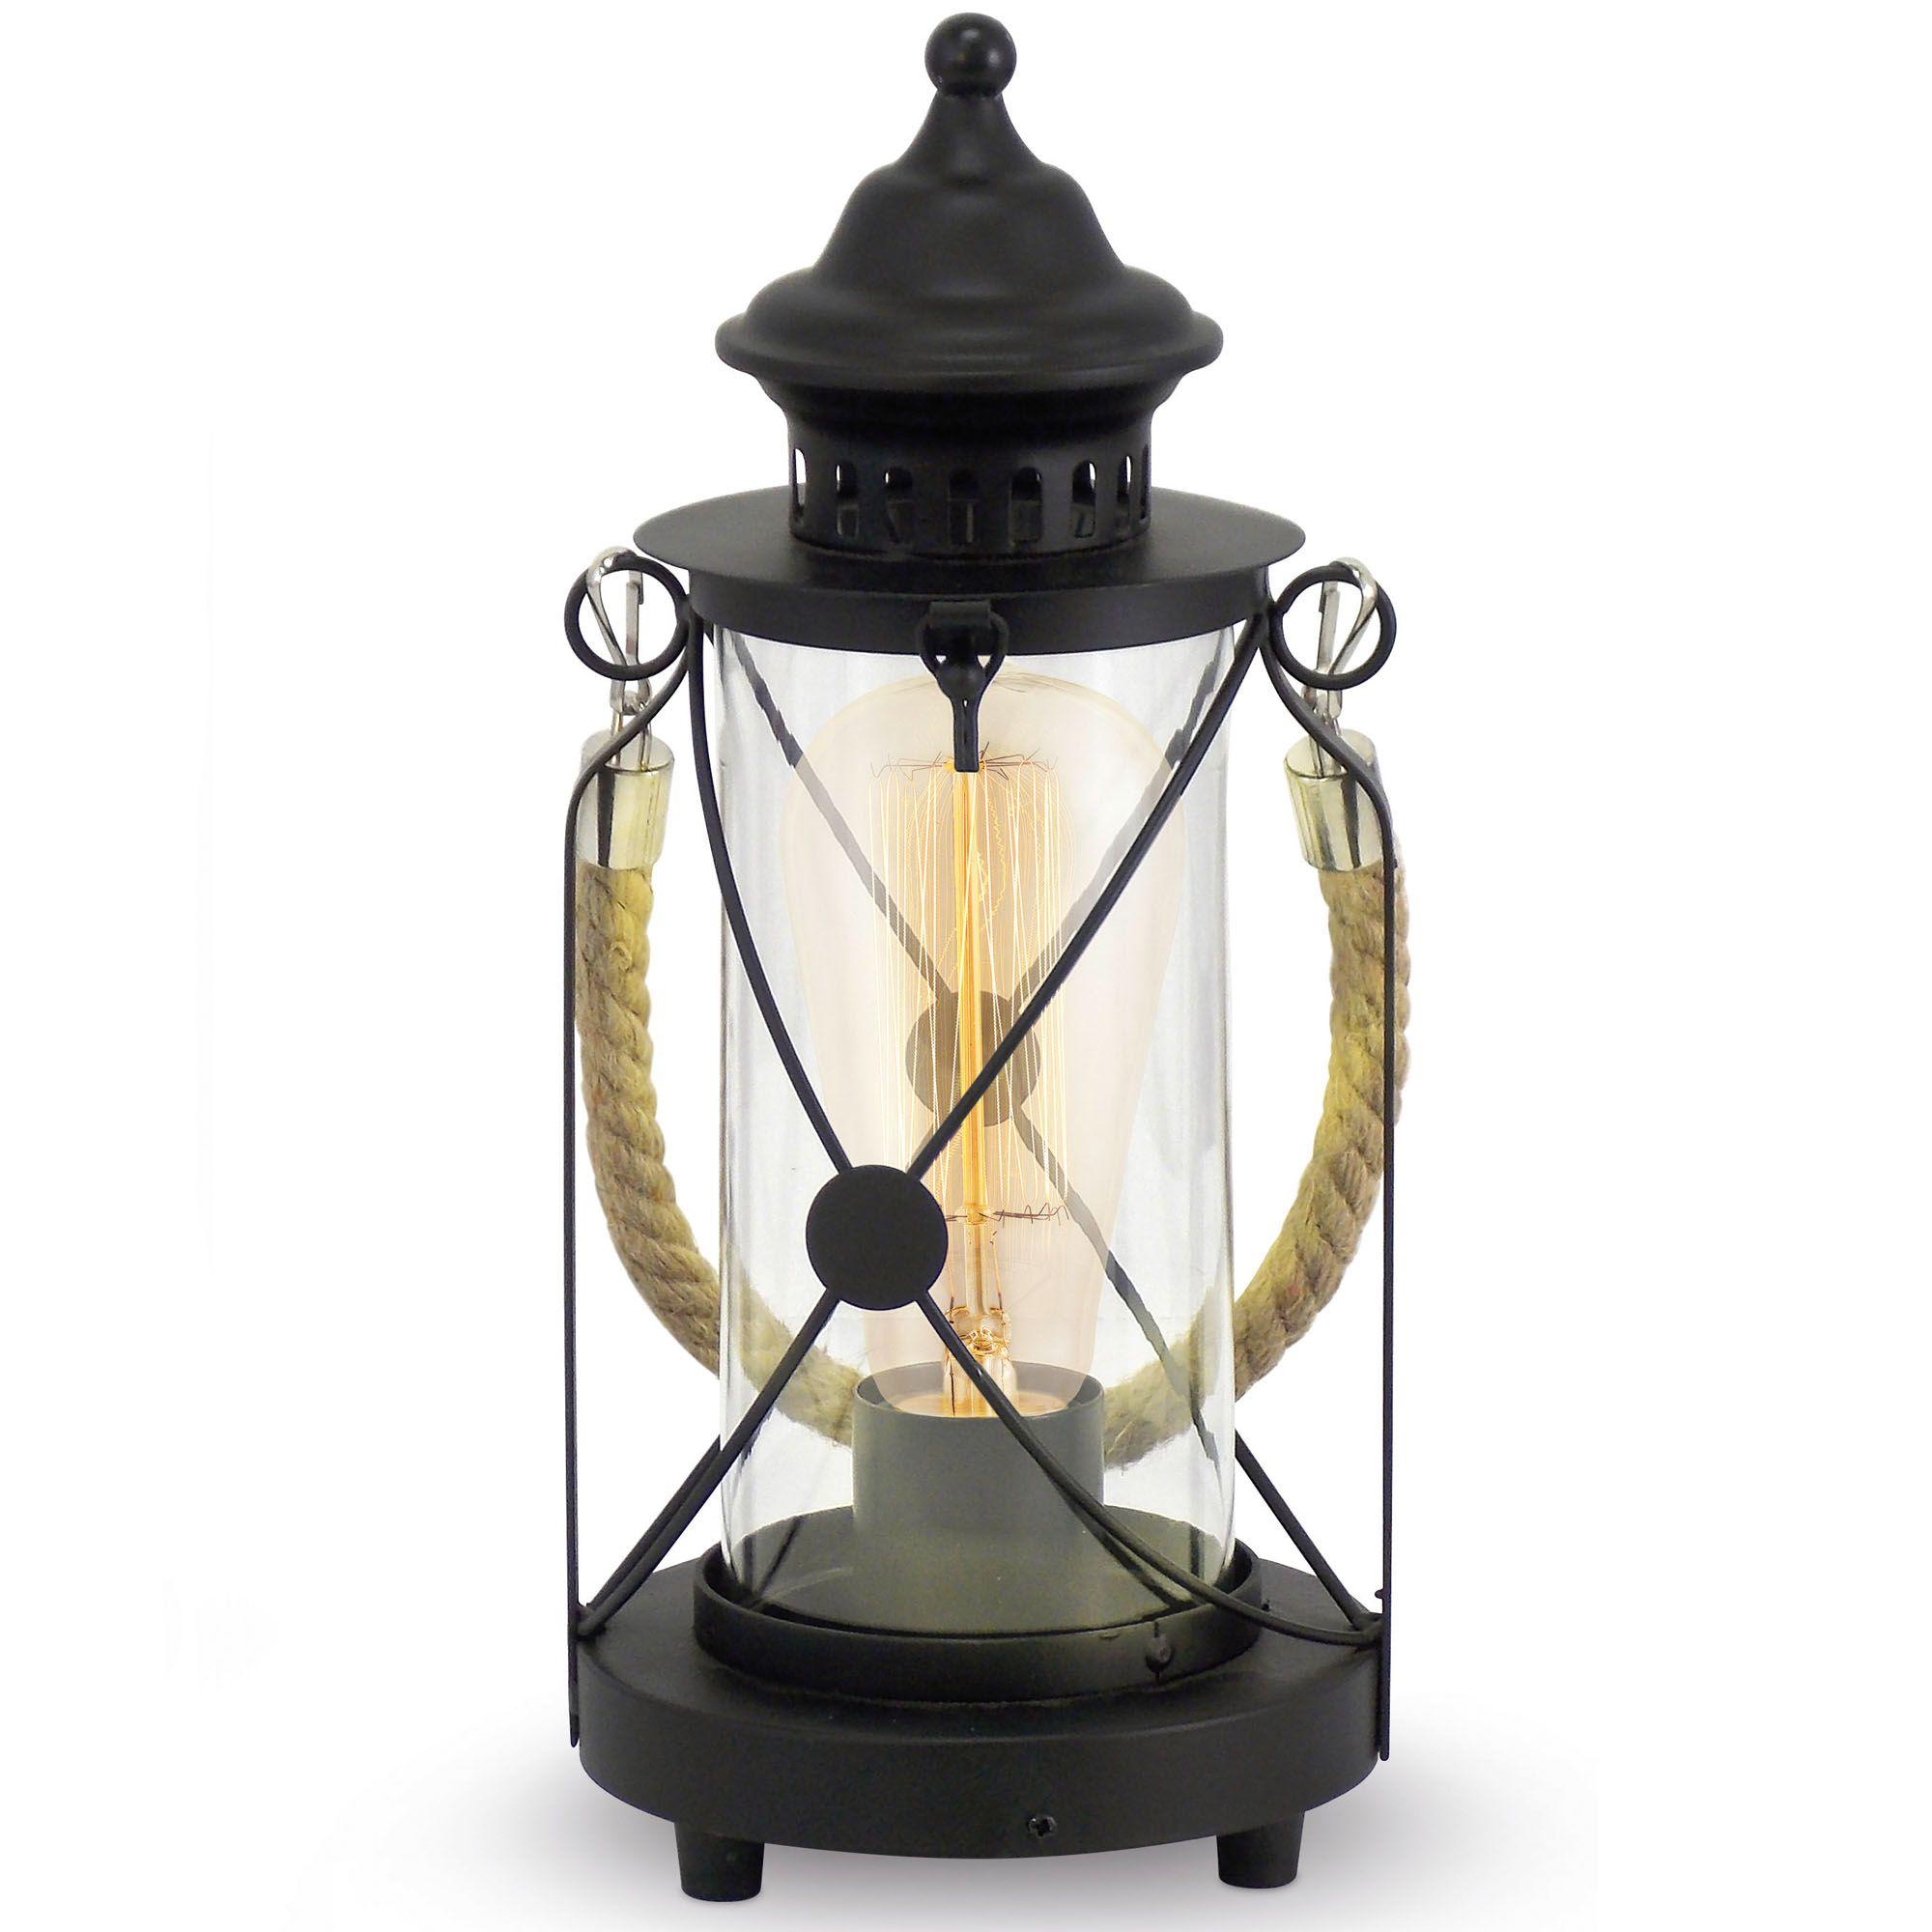 Black Eglo Bradford Lantern Table Lamp Vintage Table Lamp Lantern Table Lamp Eglo